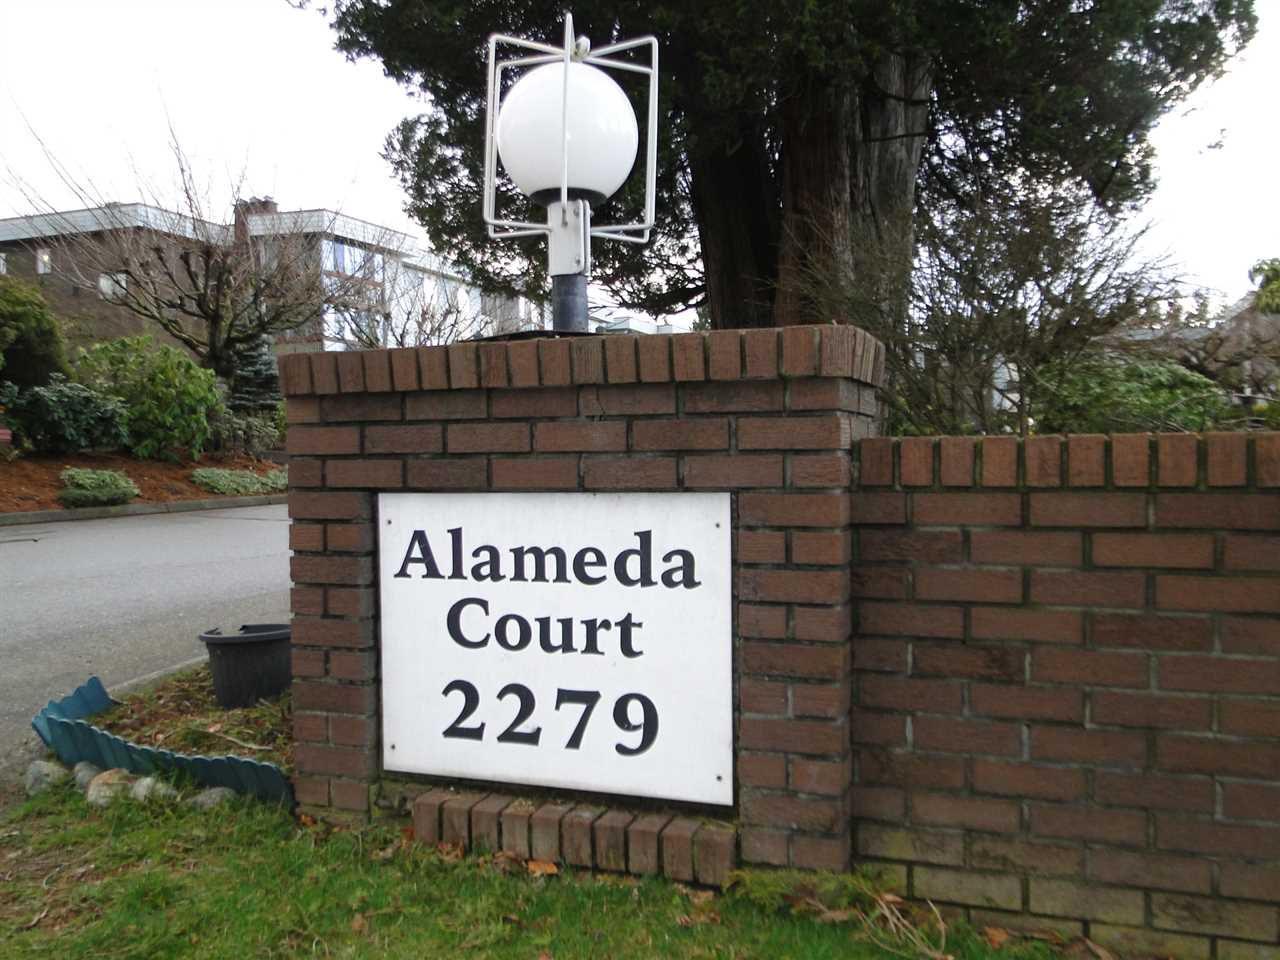 "Main Photo: 307 2279 MCCALLUM Road in Abbotsford: Central Abbotsford Condo for sale in ""Alameda Court"" : MLS®# R2238587"